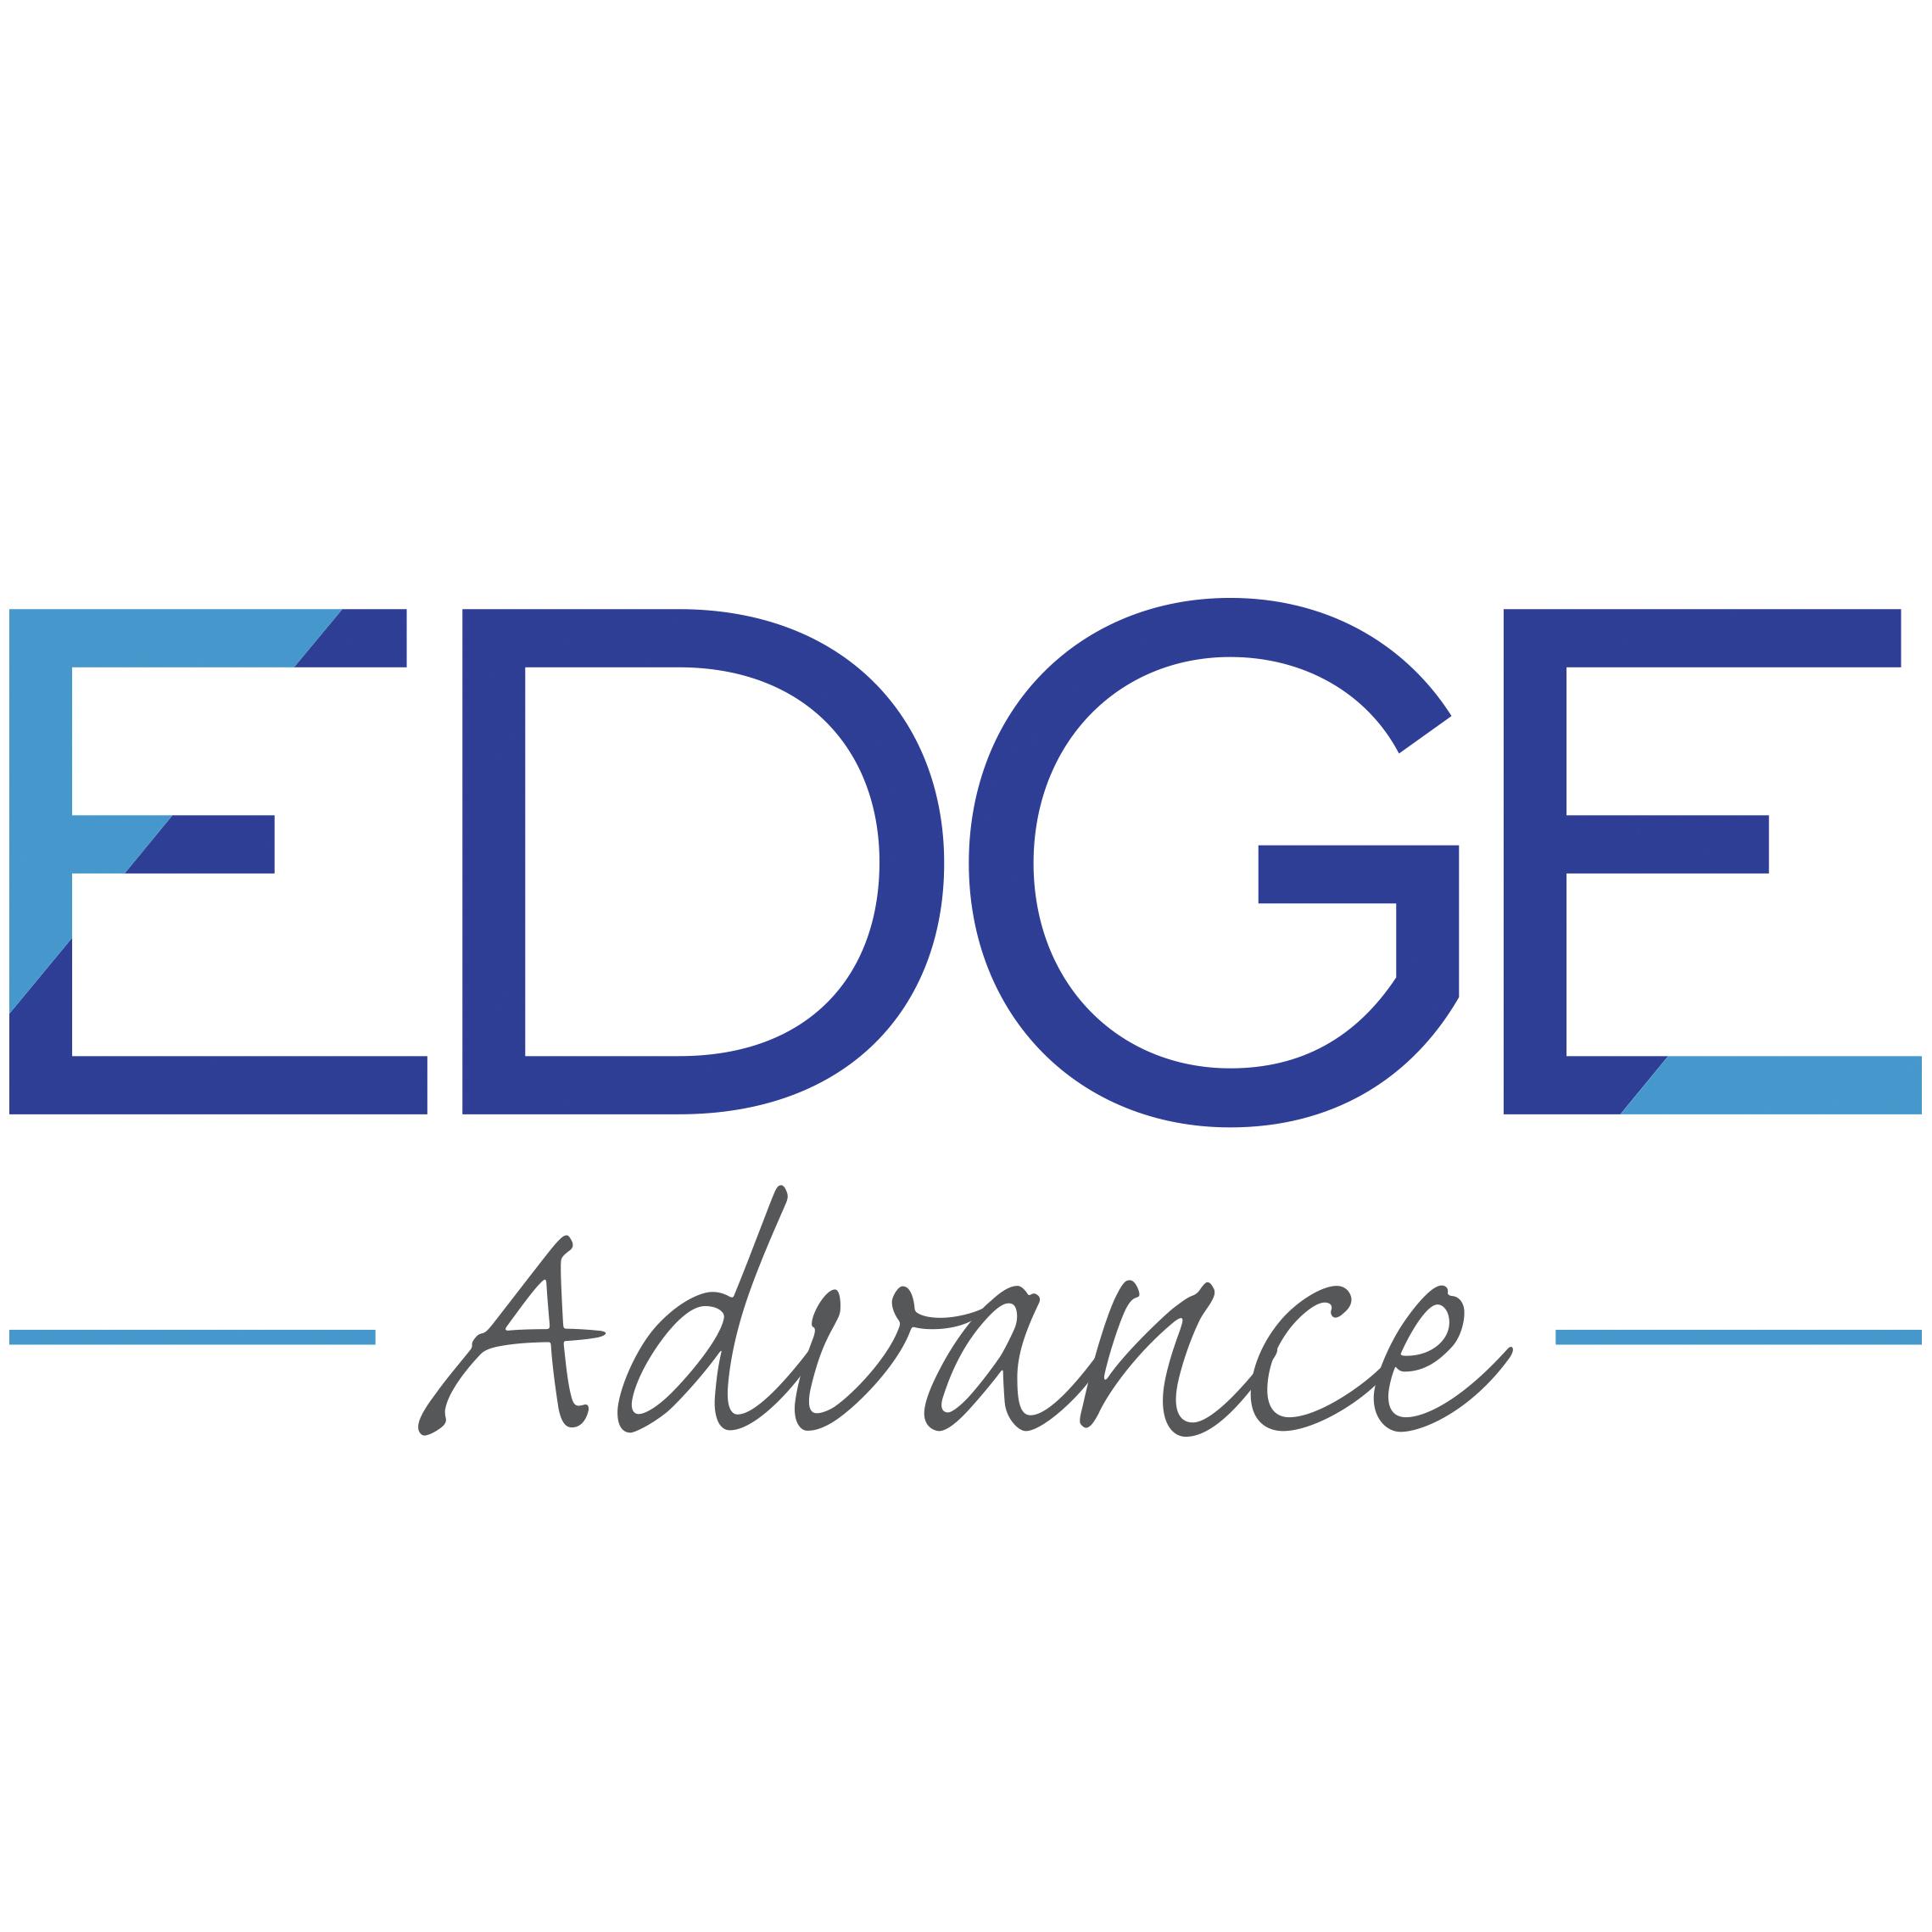 Edge advance logo